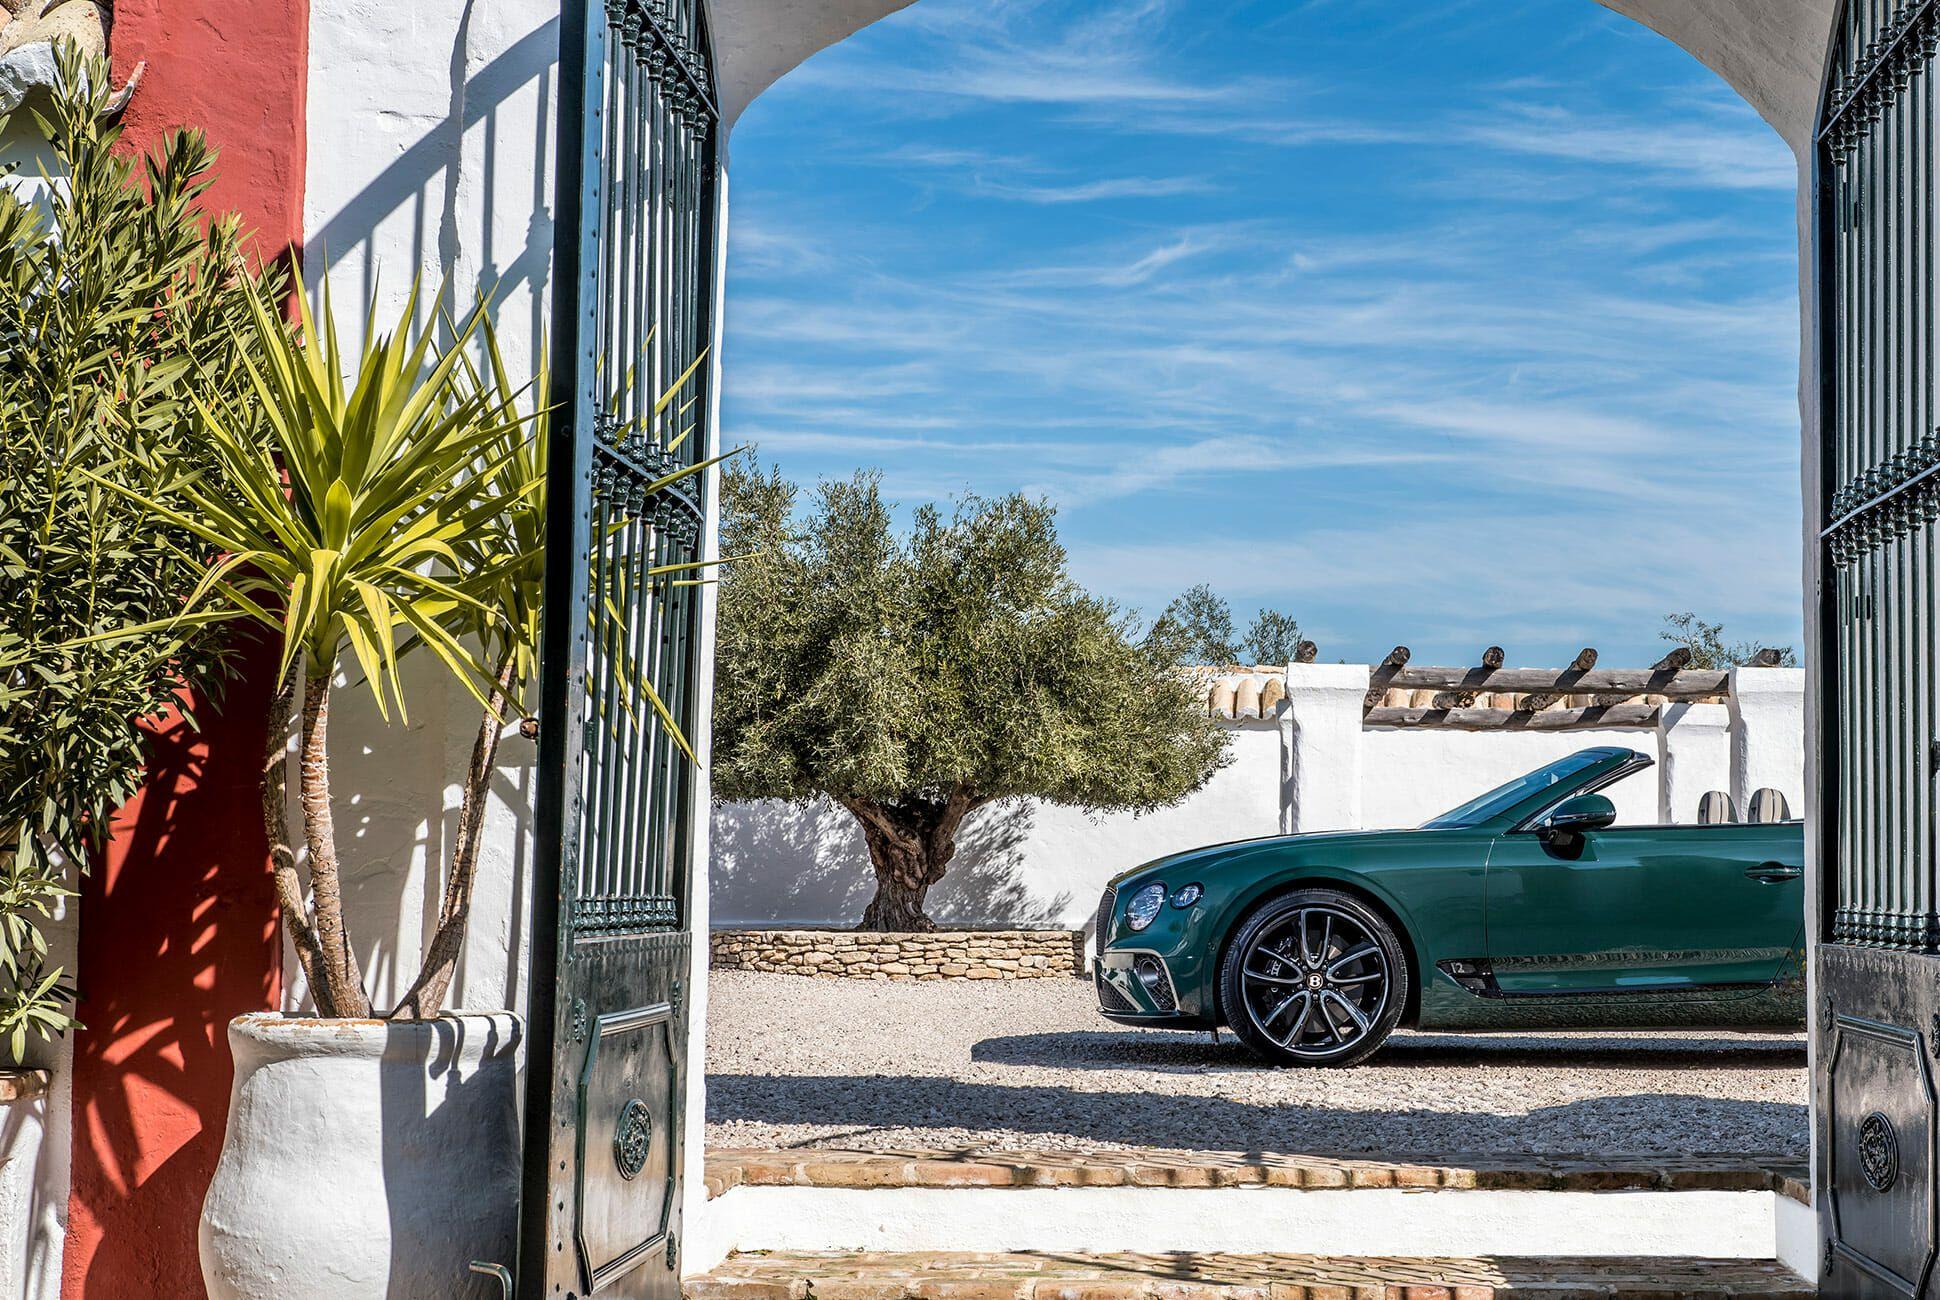 Bentley-Continental-GTC-Review-gear-patrol-slide-3